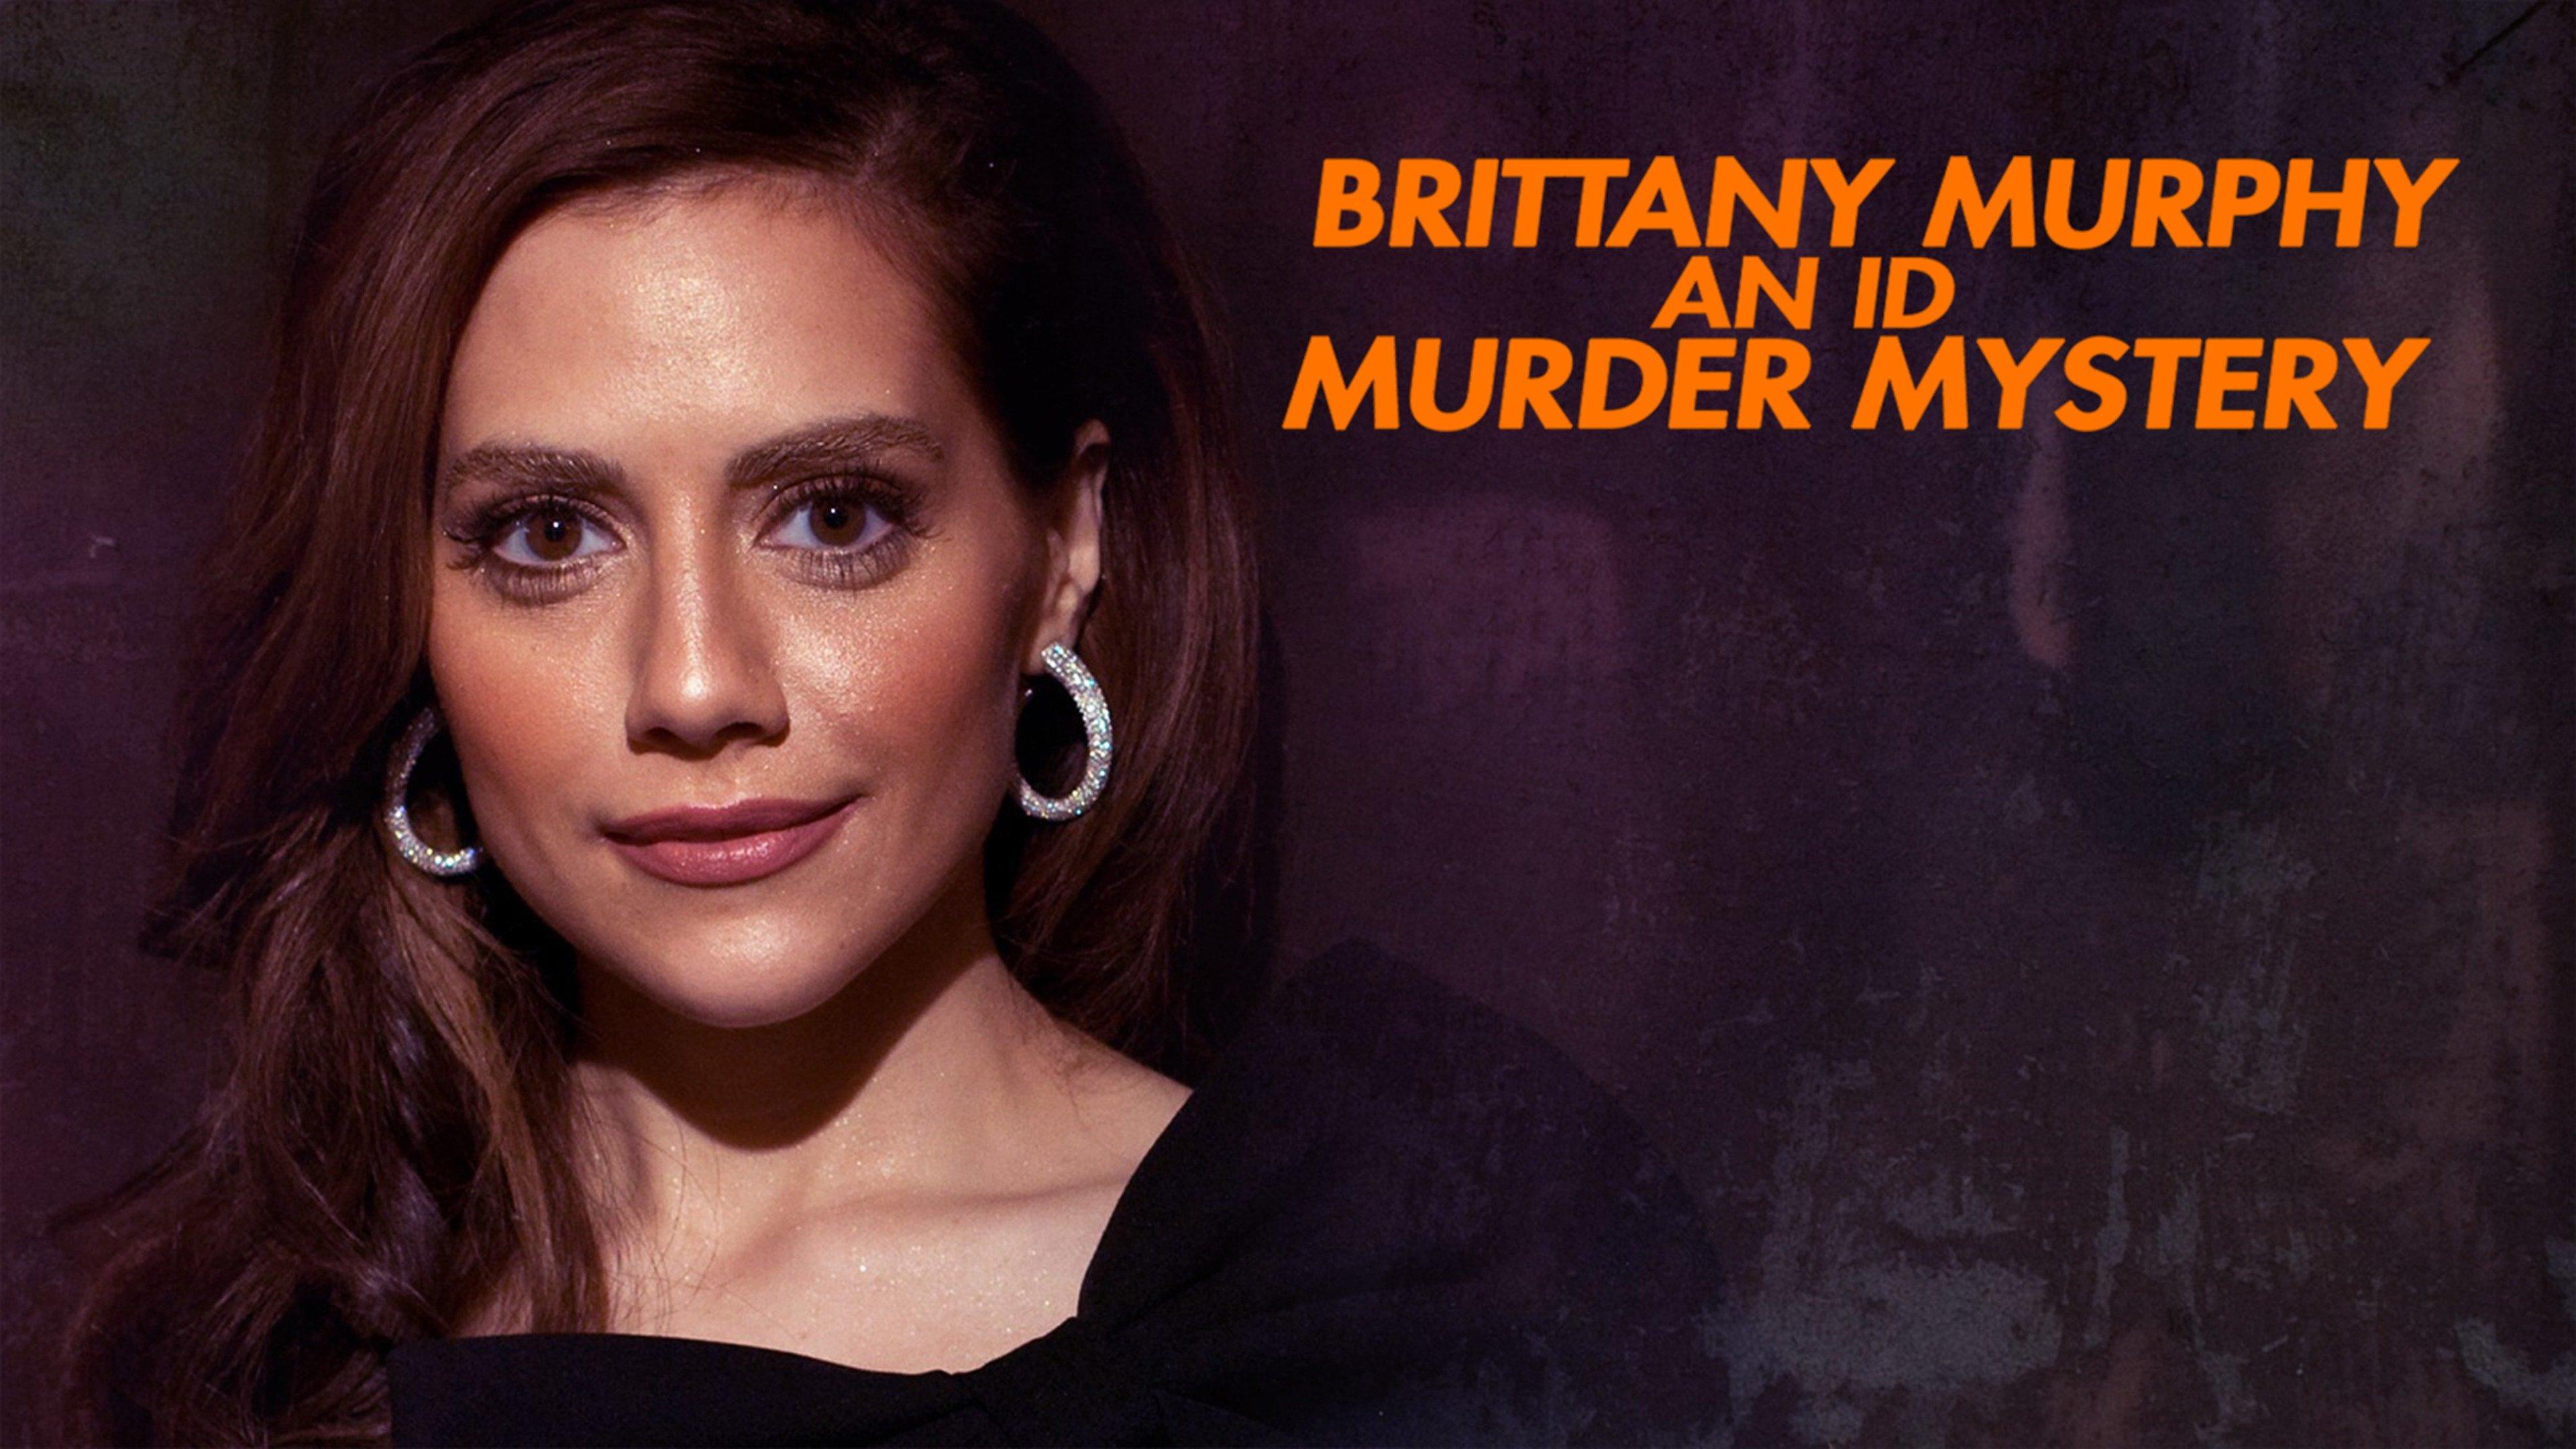 Brittany Murphy: An ID Murder Mystery